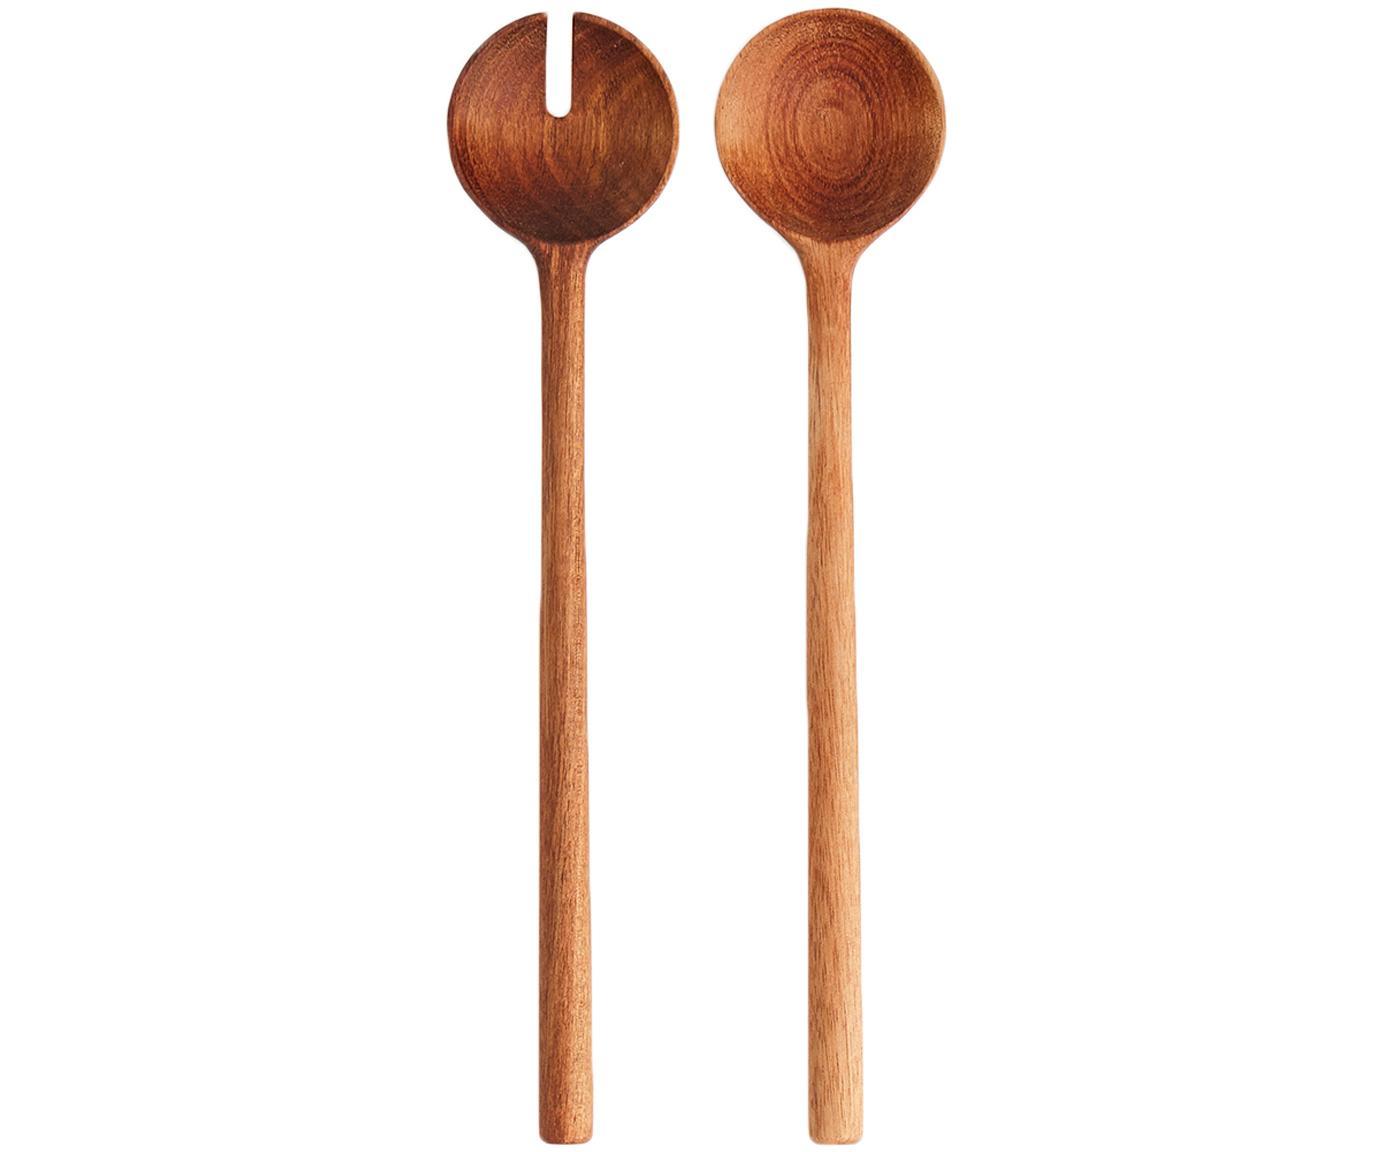 Salatbesteck Matera aus Akazienholz, 2er-Set, Akazienholz, Akazienholz, L 29 cm